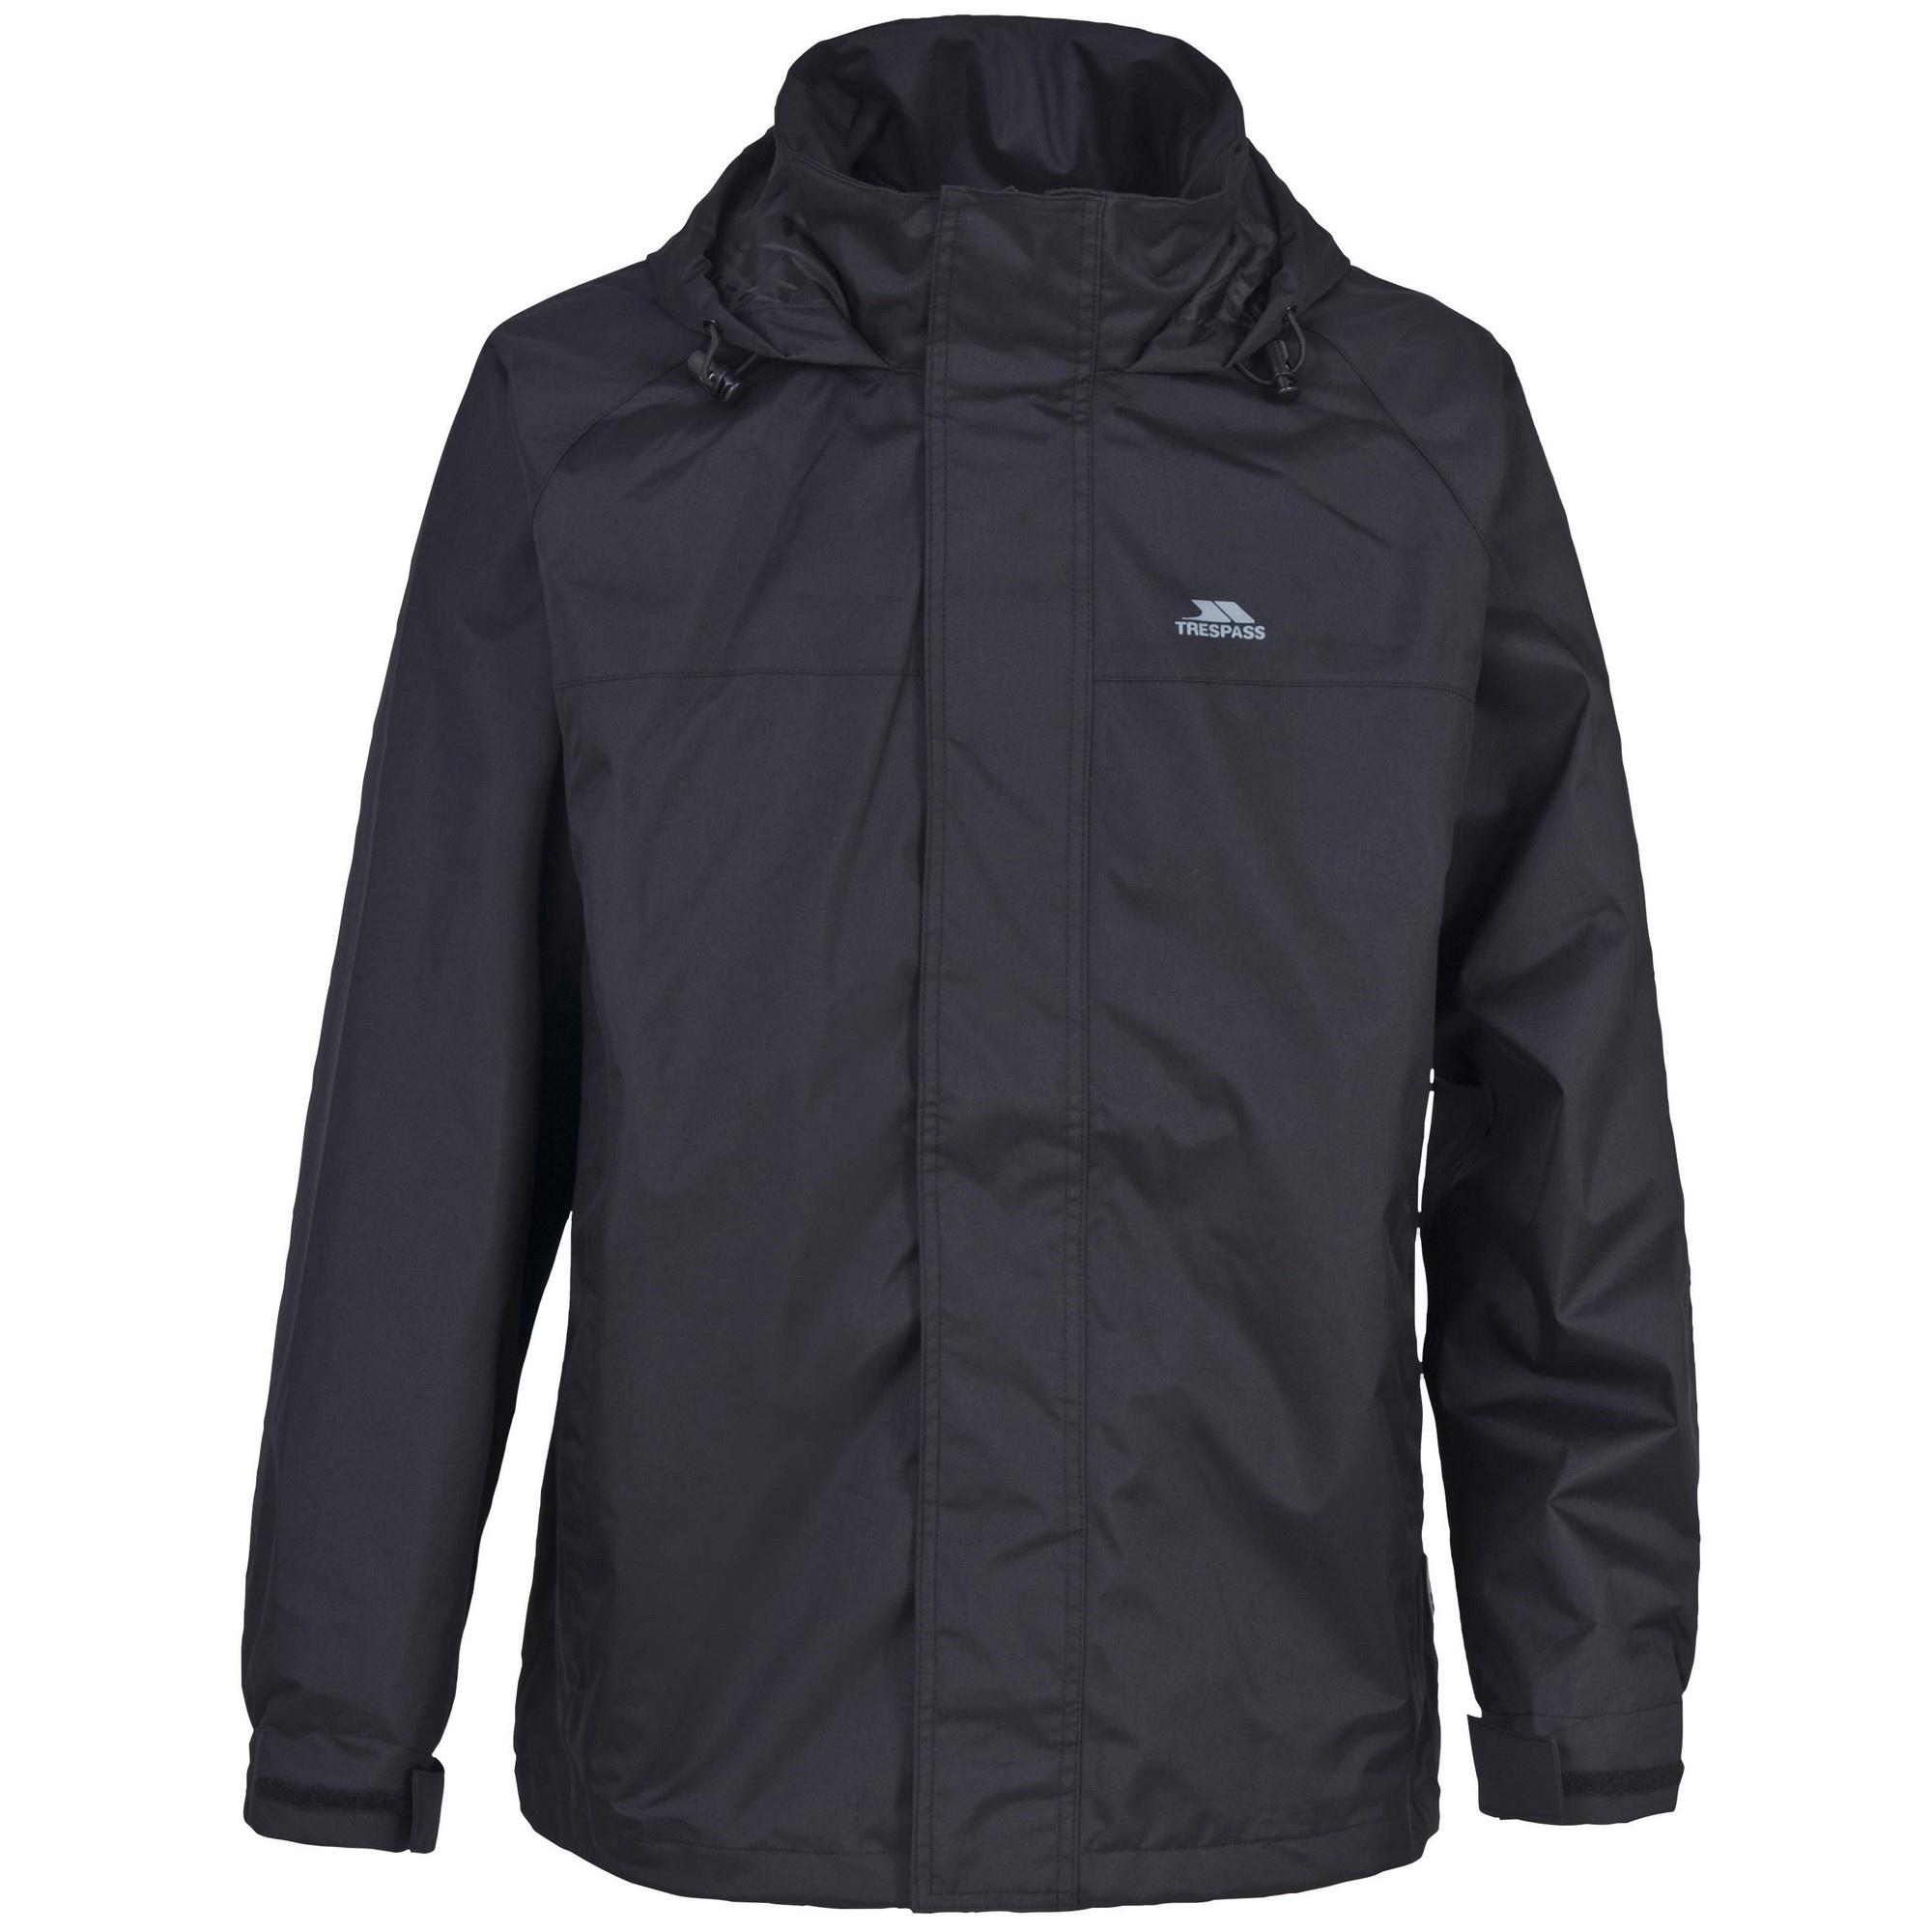 Trespass Childrens Boys Nabro Waterproof Hooded Winter Jacket/Coat | EBay